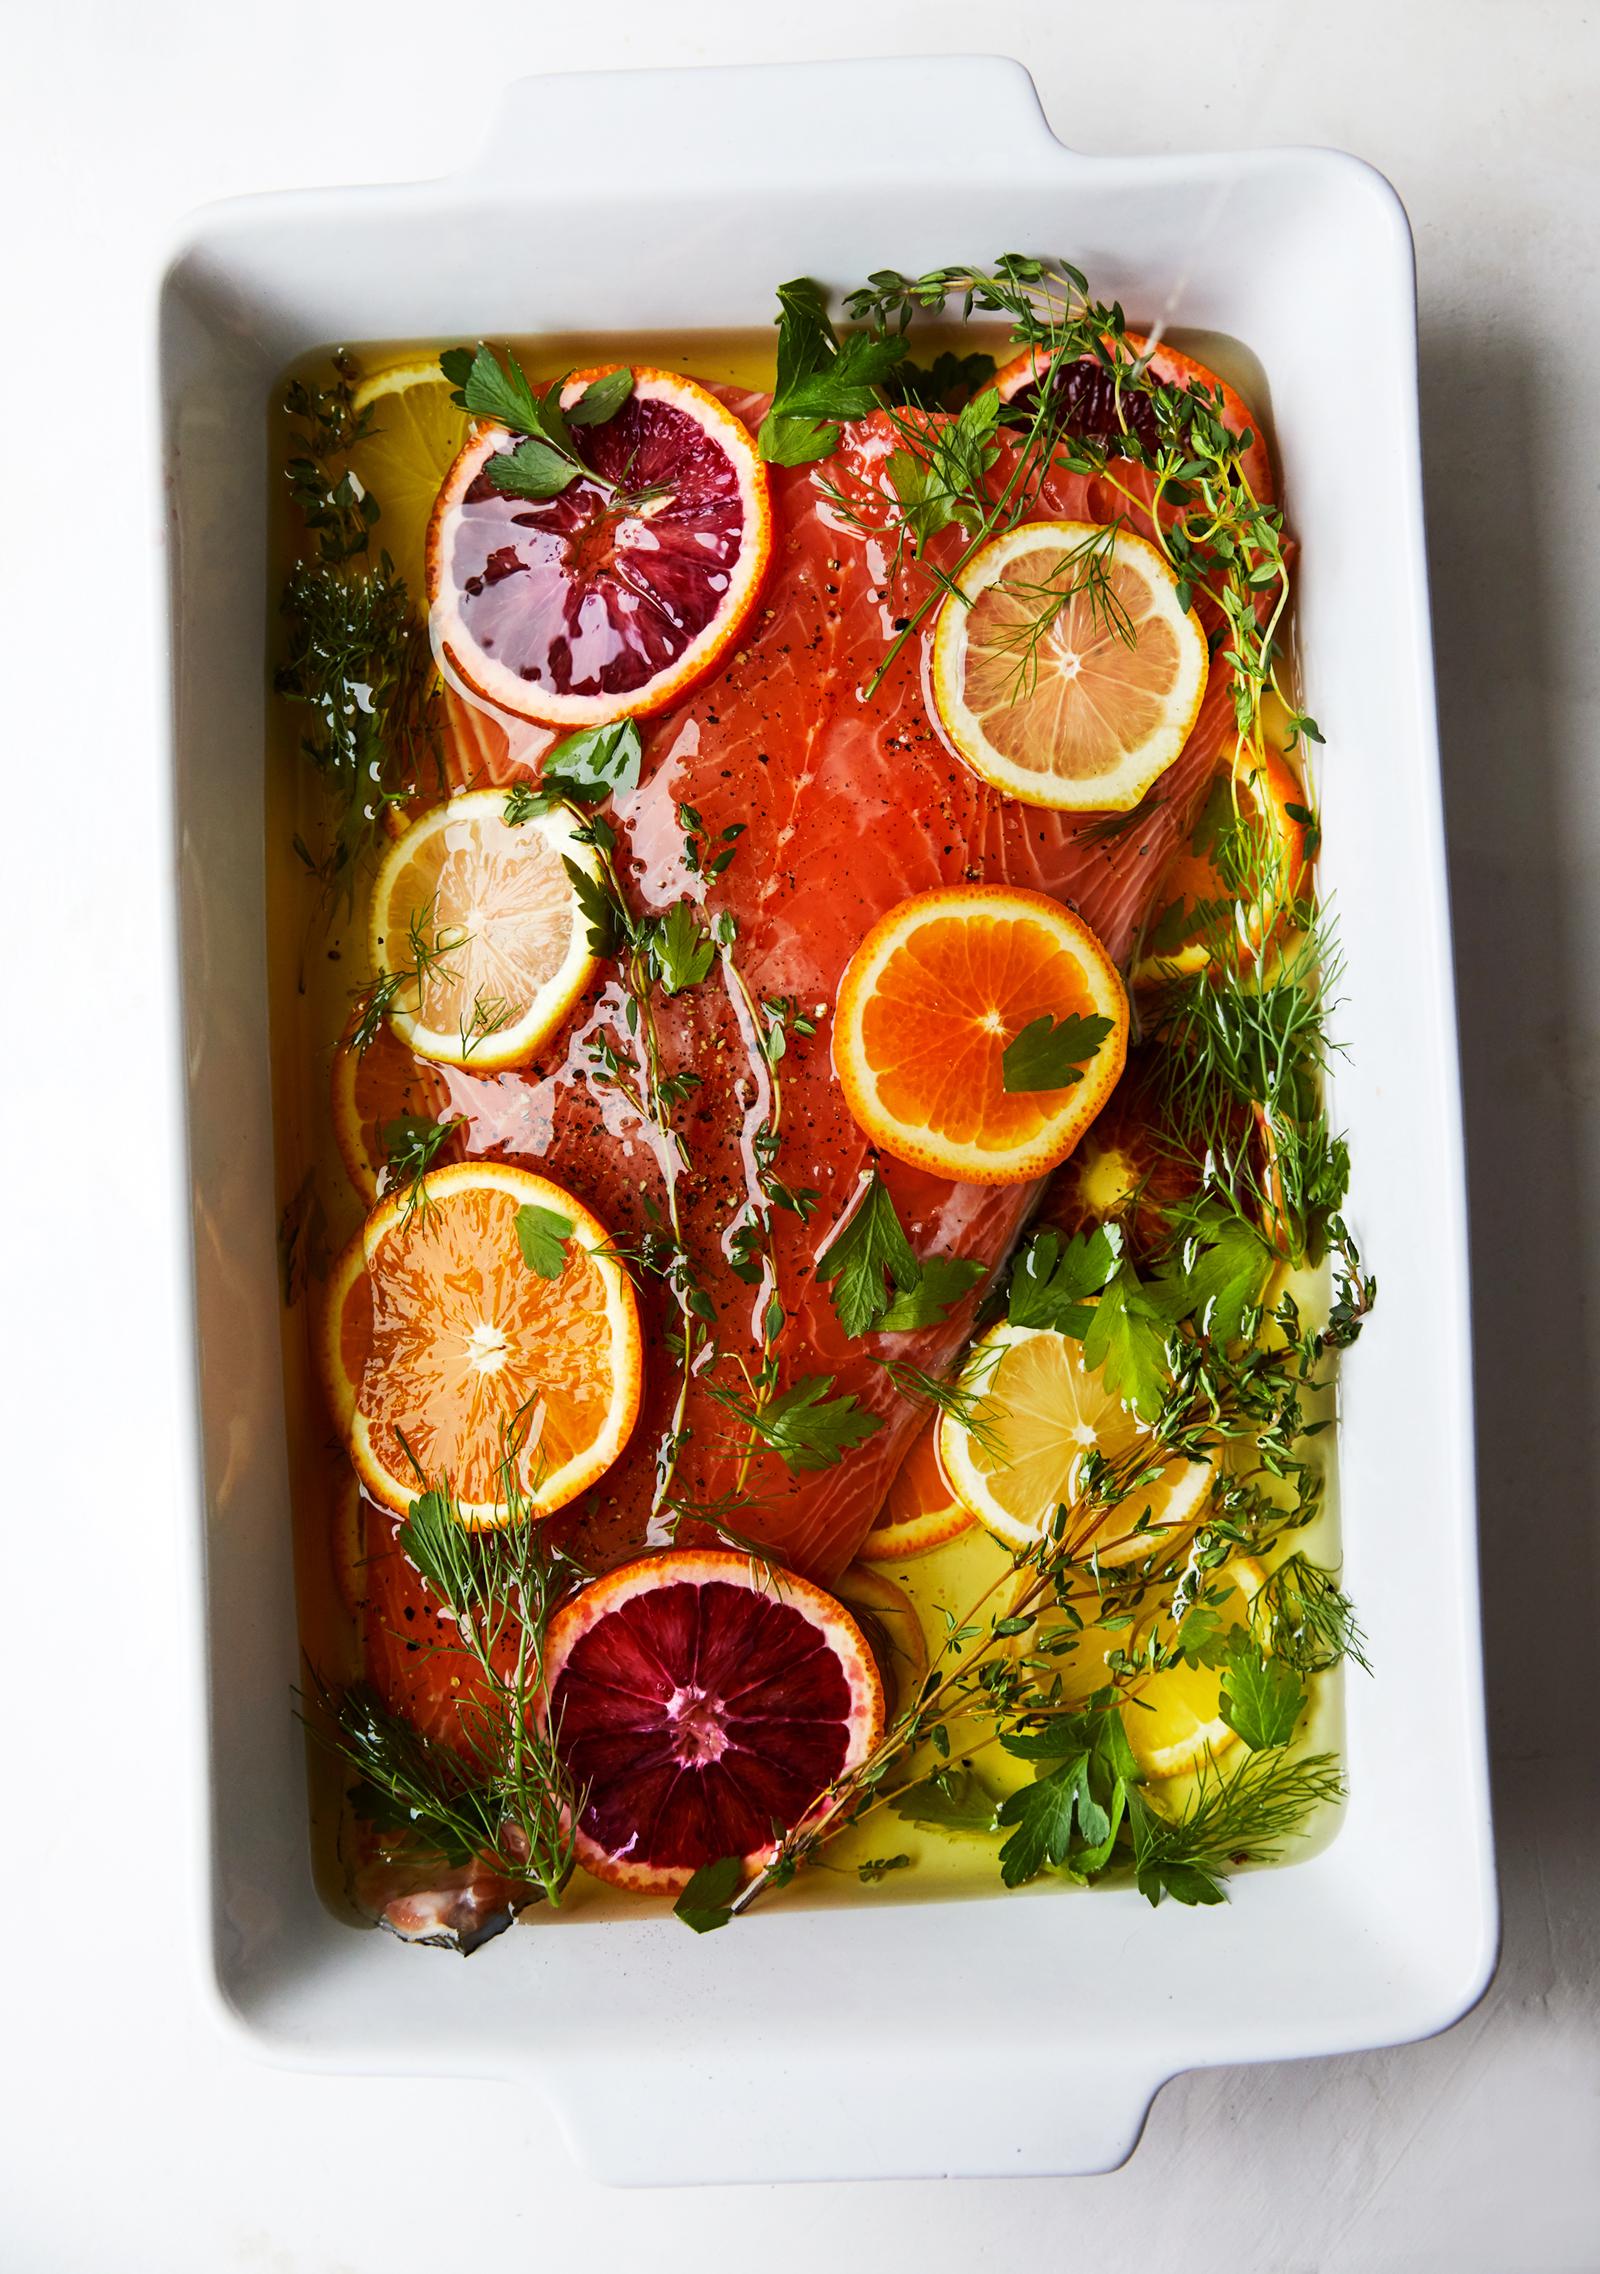 Slow-Roasted-Citrus-Salmon1337_02.jpg